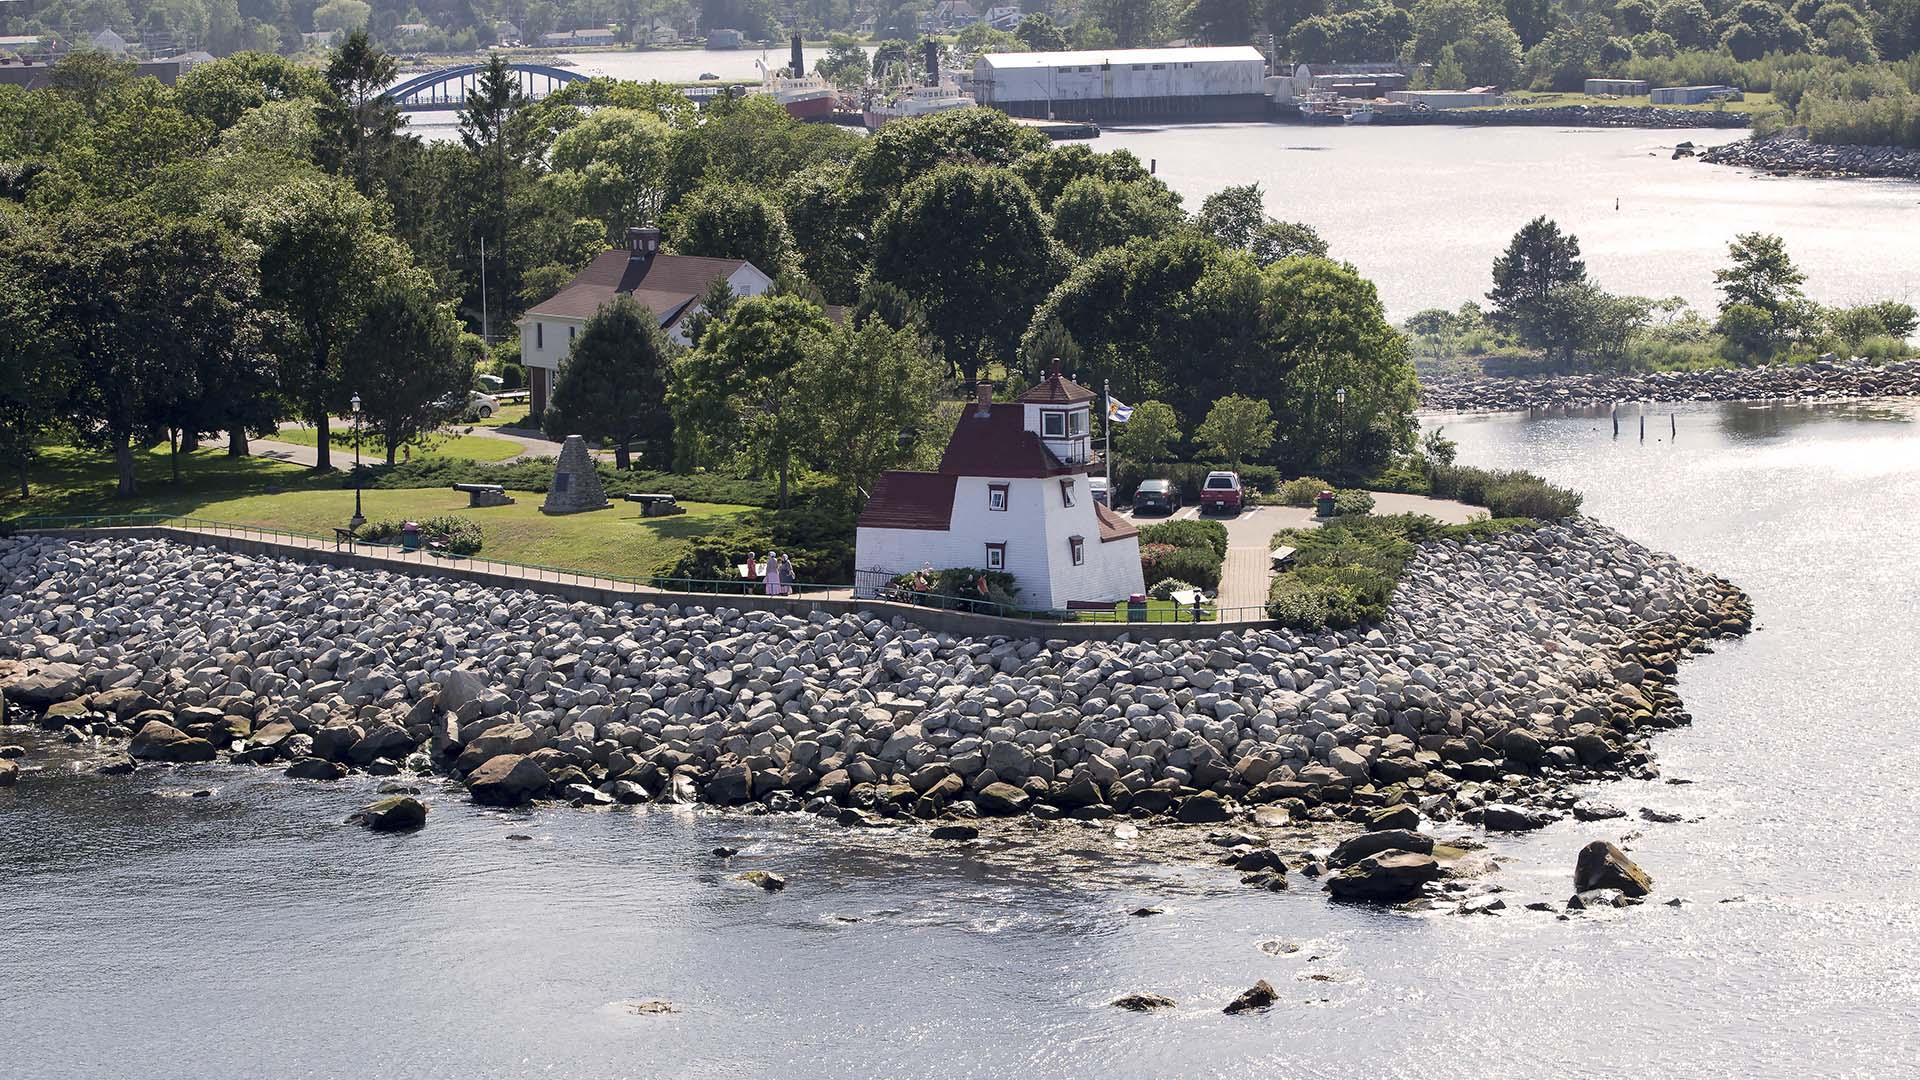 Fort Point Light housePark, Liverpool, Nova Scotia